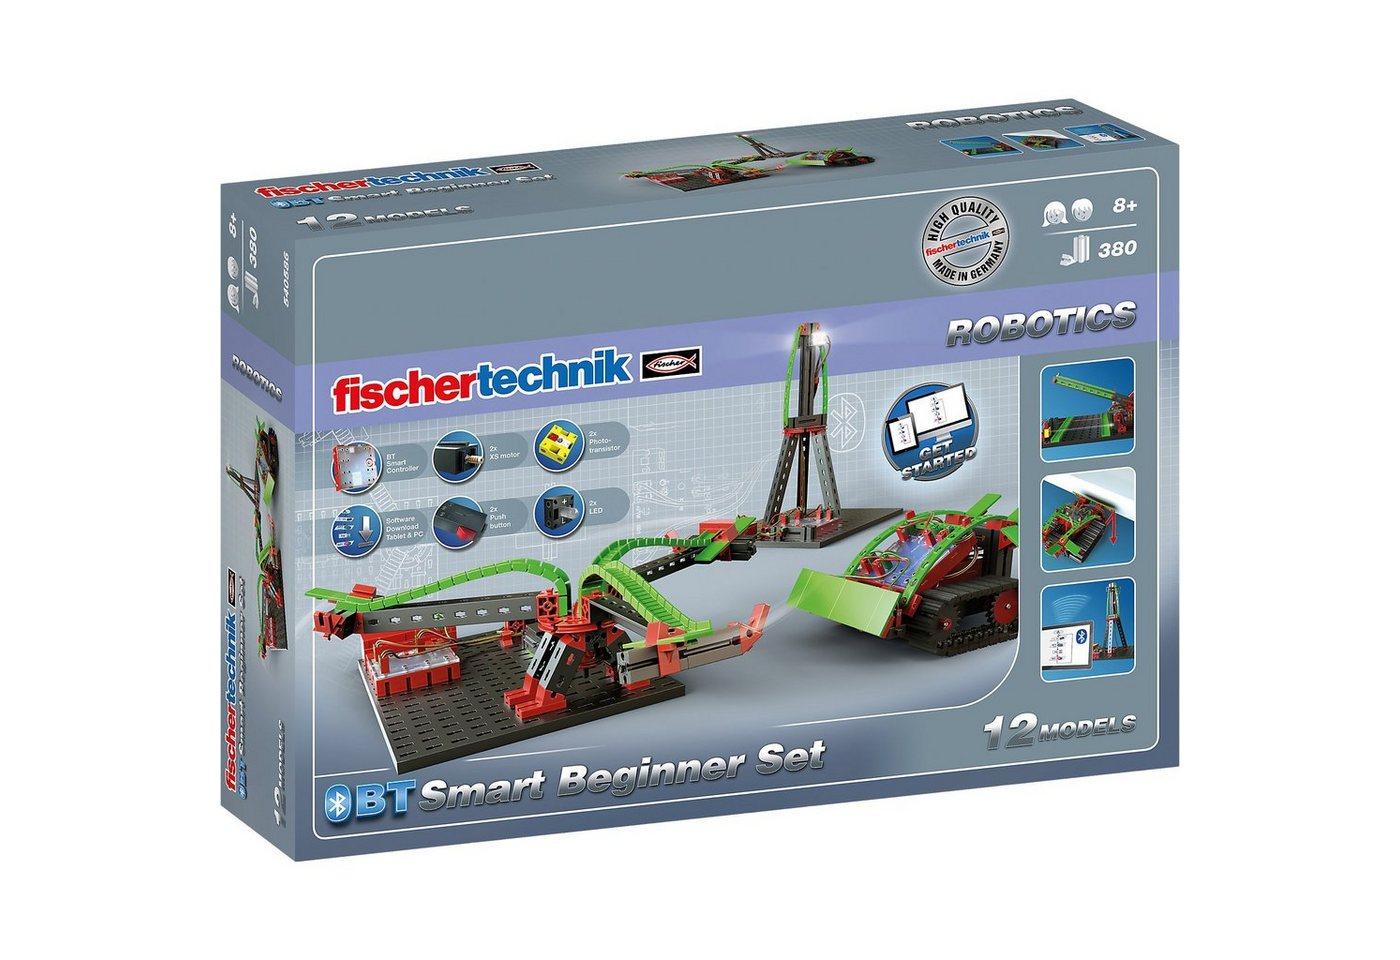 fischertechnik BT Smart Beginner Set